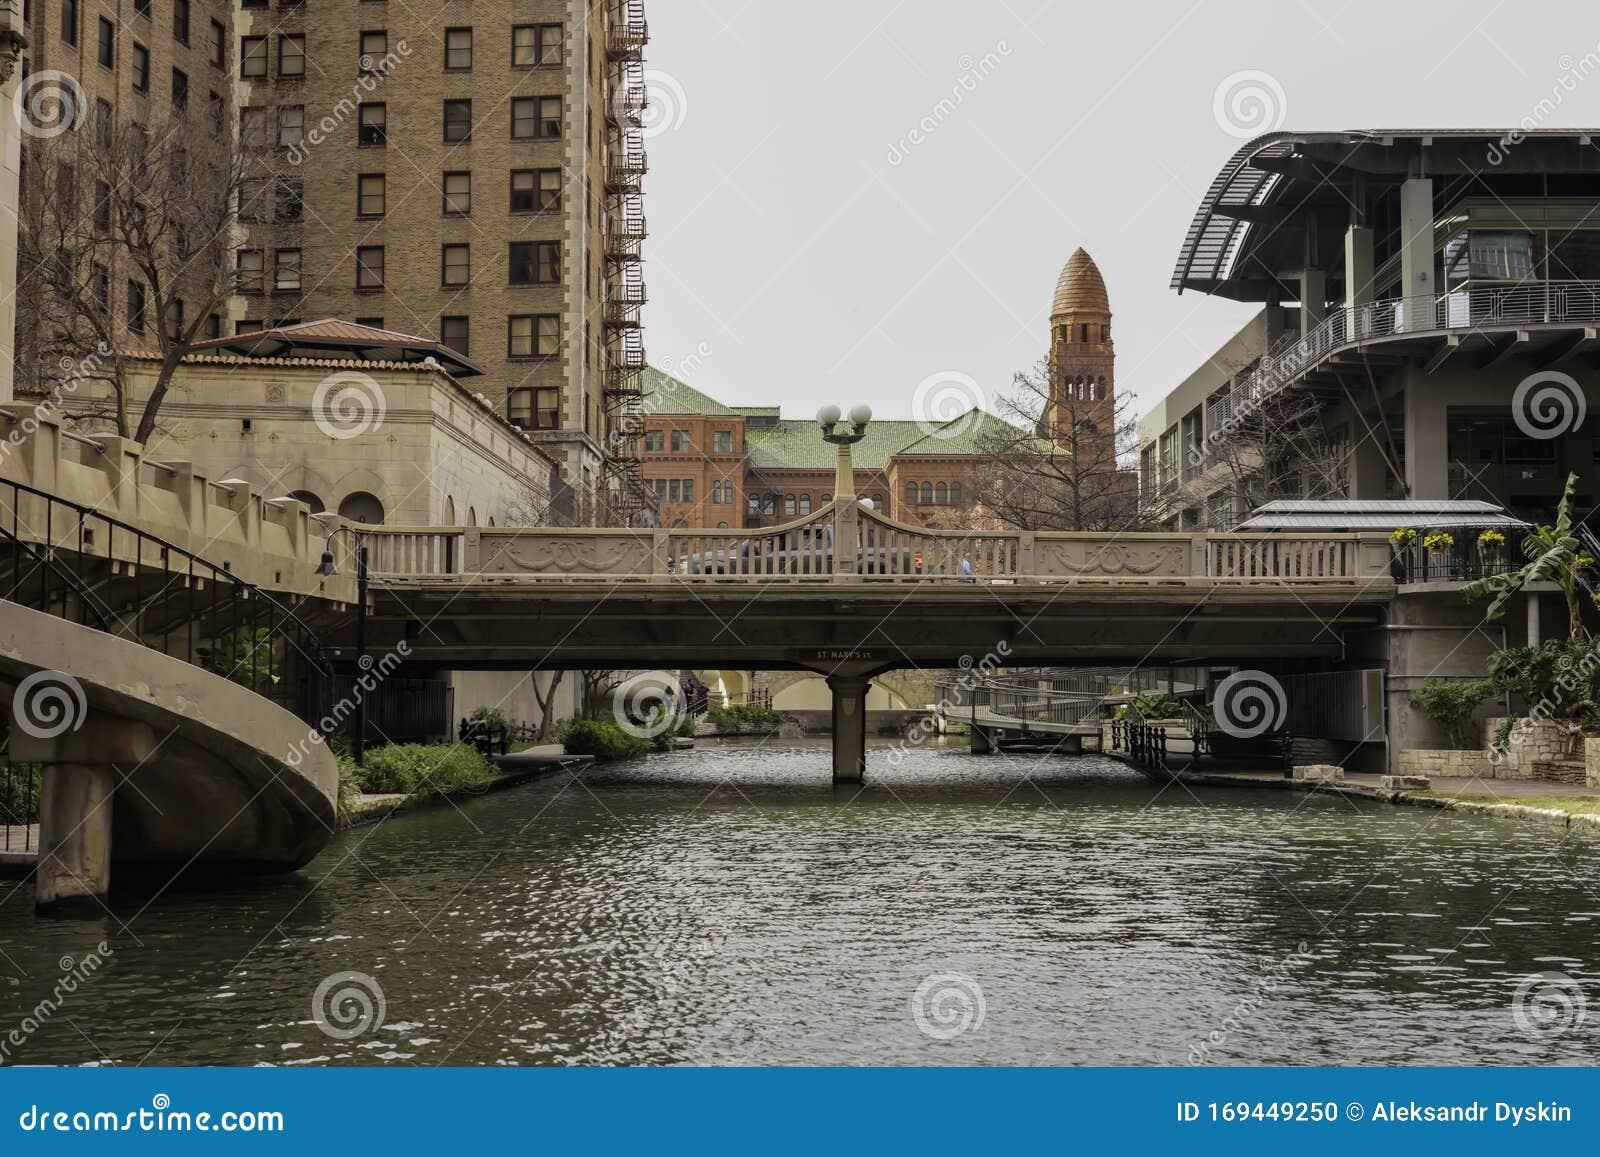 San Antonio Texas Usa Riverwalk Landscapes And Architecture